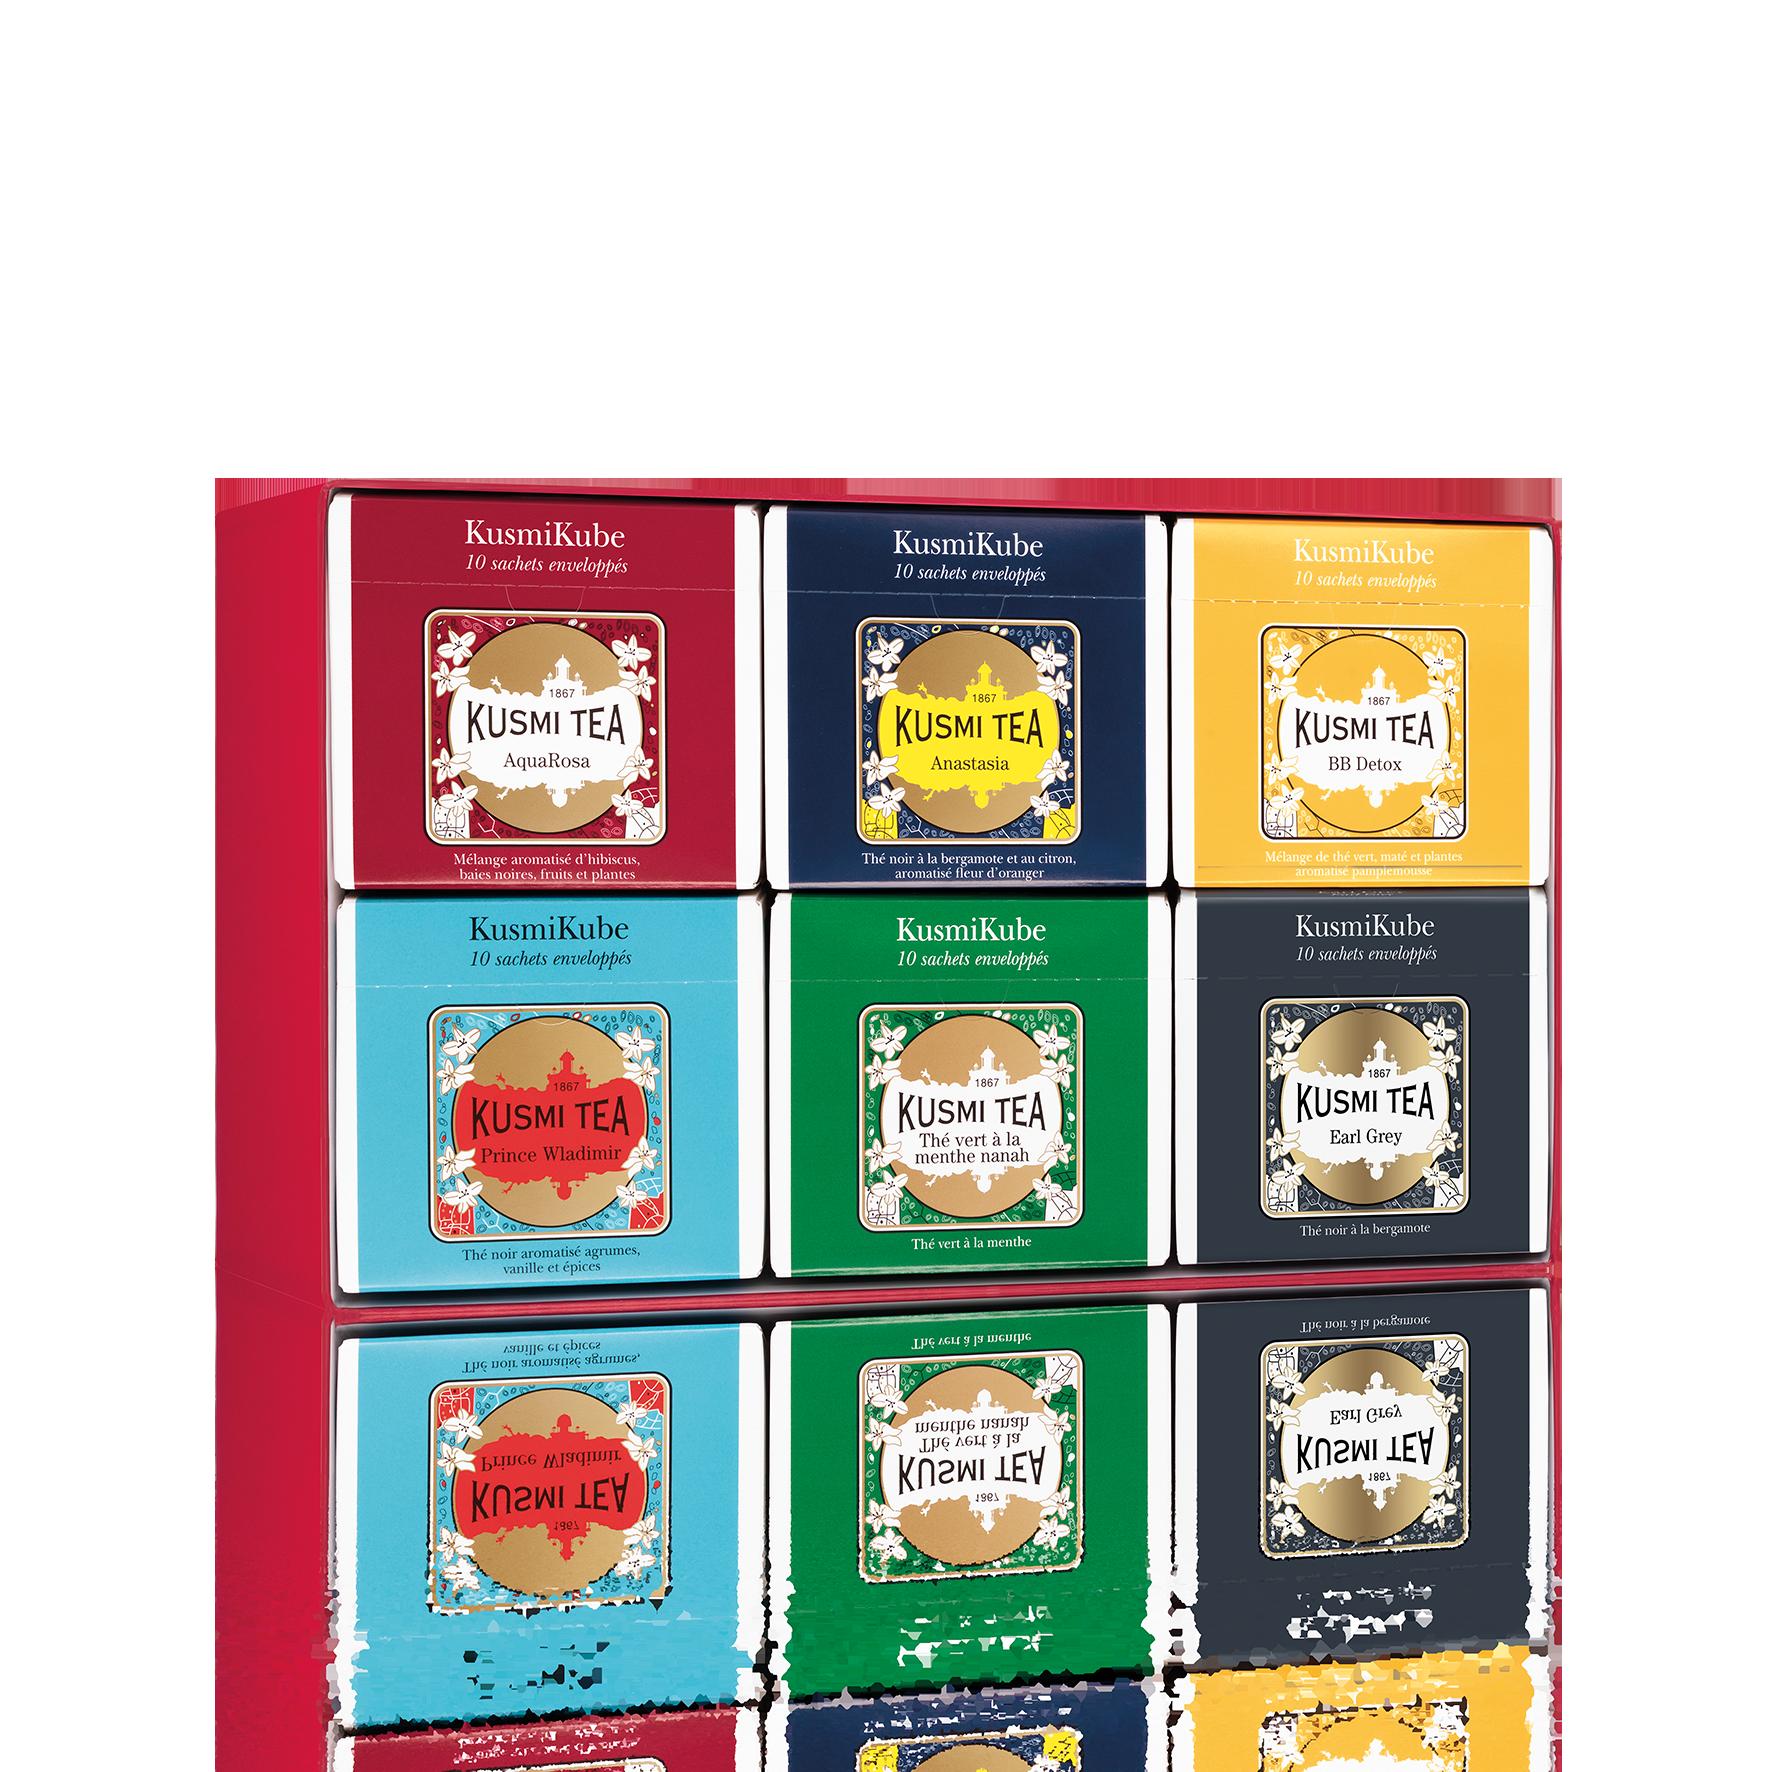 Coffret 6 KusmiKubes - Coffret pour 6 KusmiKubes - Kusmi Tea